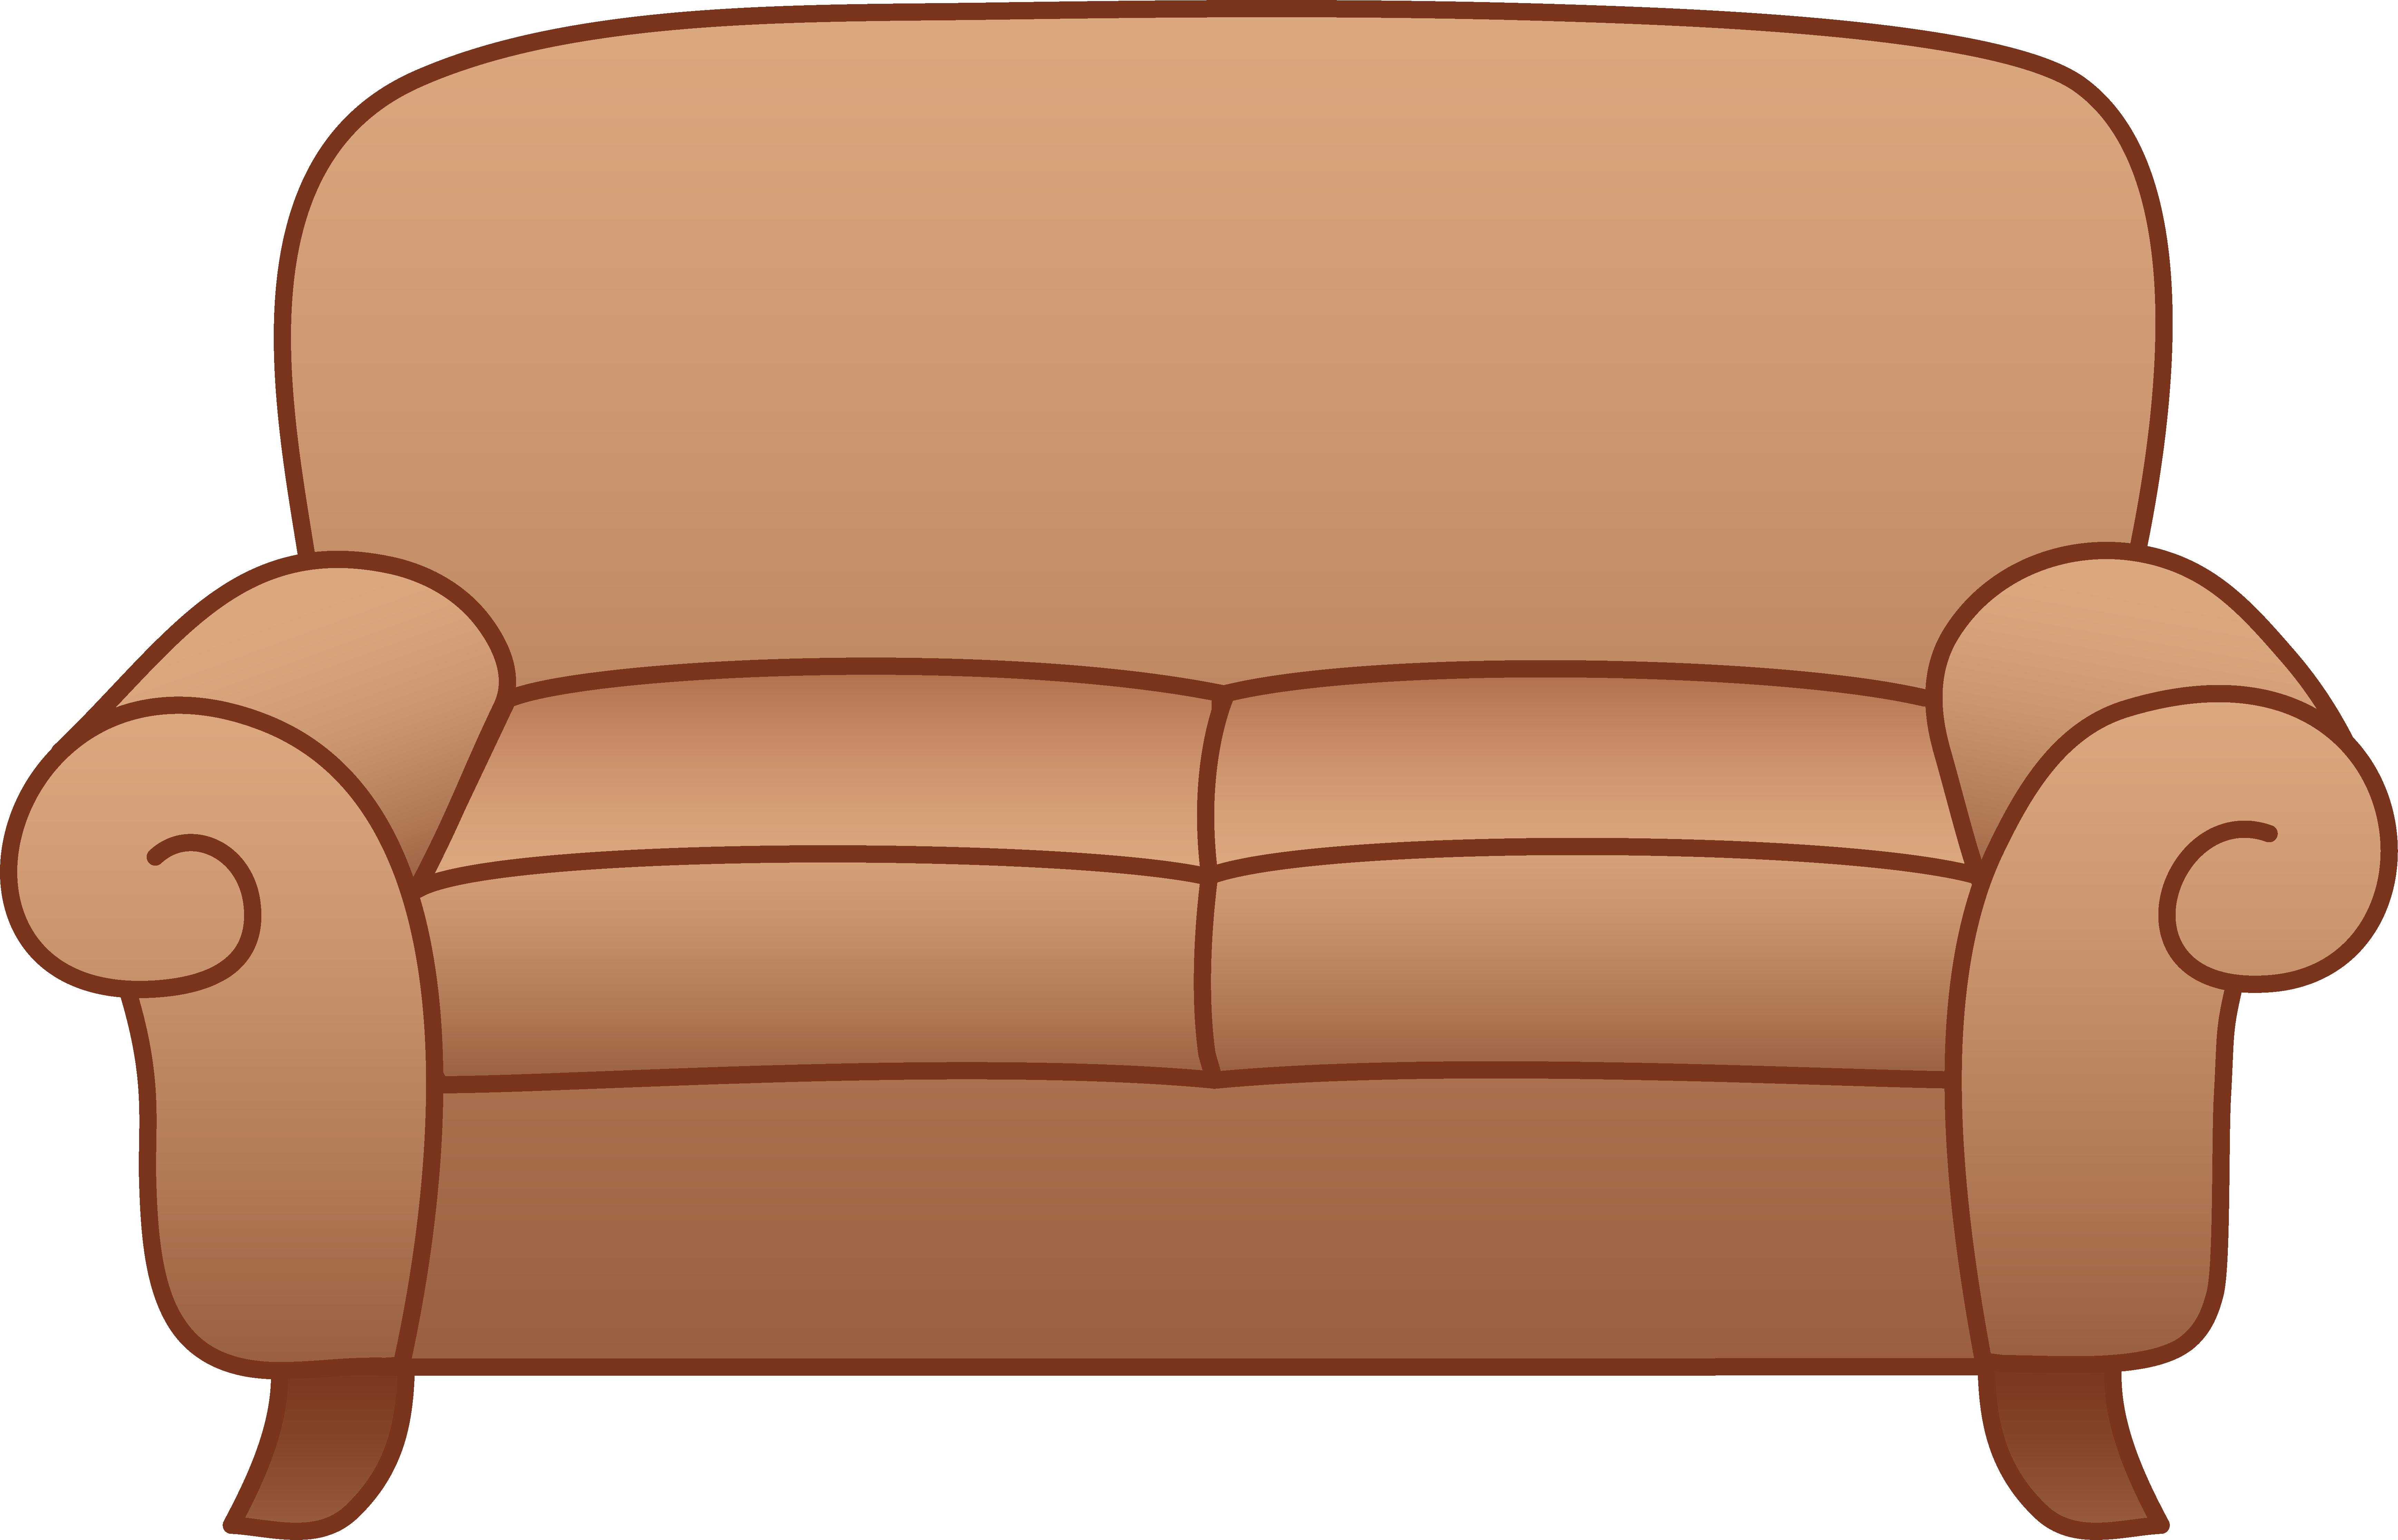 6947x4462 Beige Living Room Sofa Free Clip Art